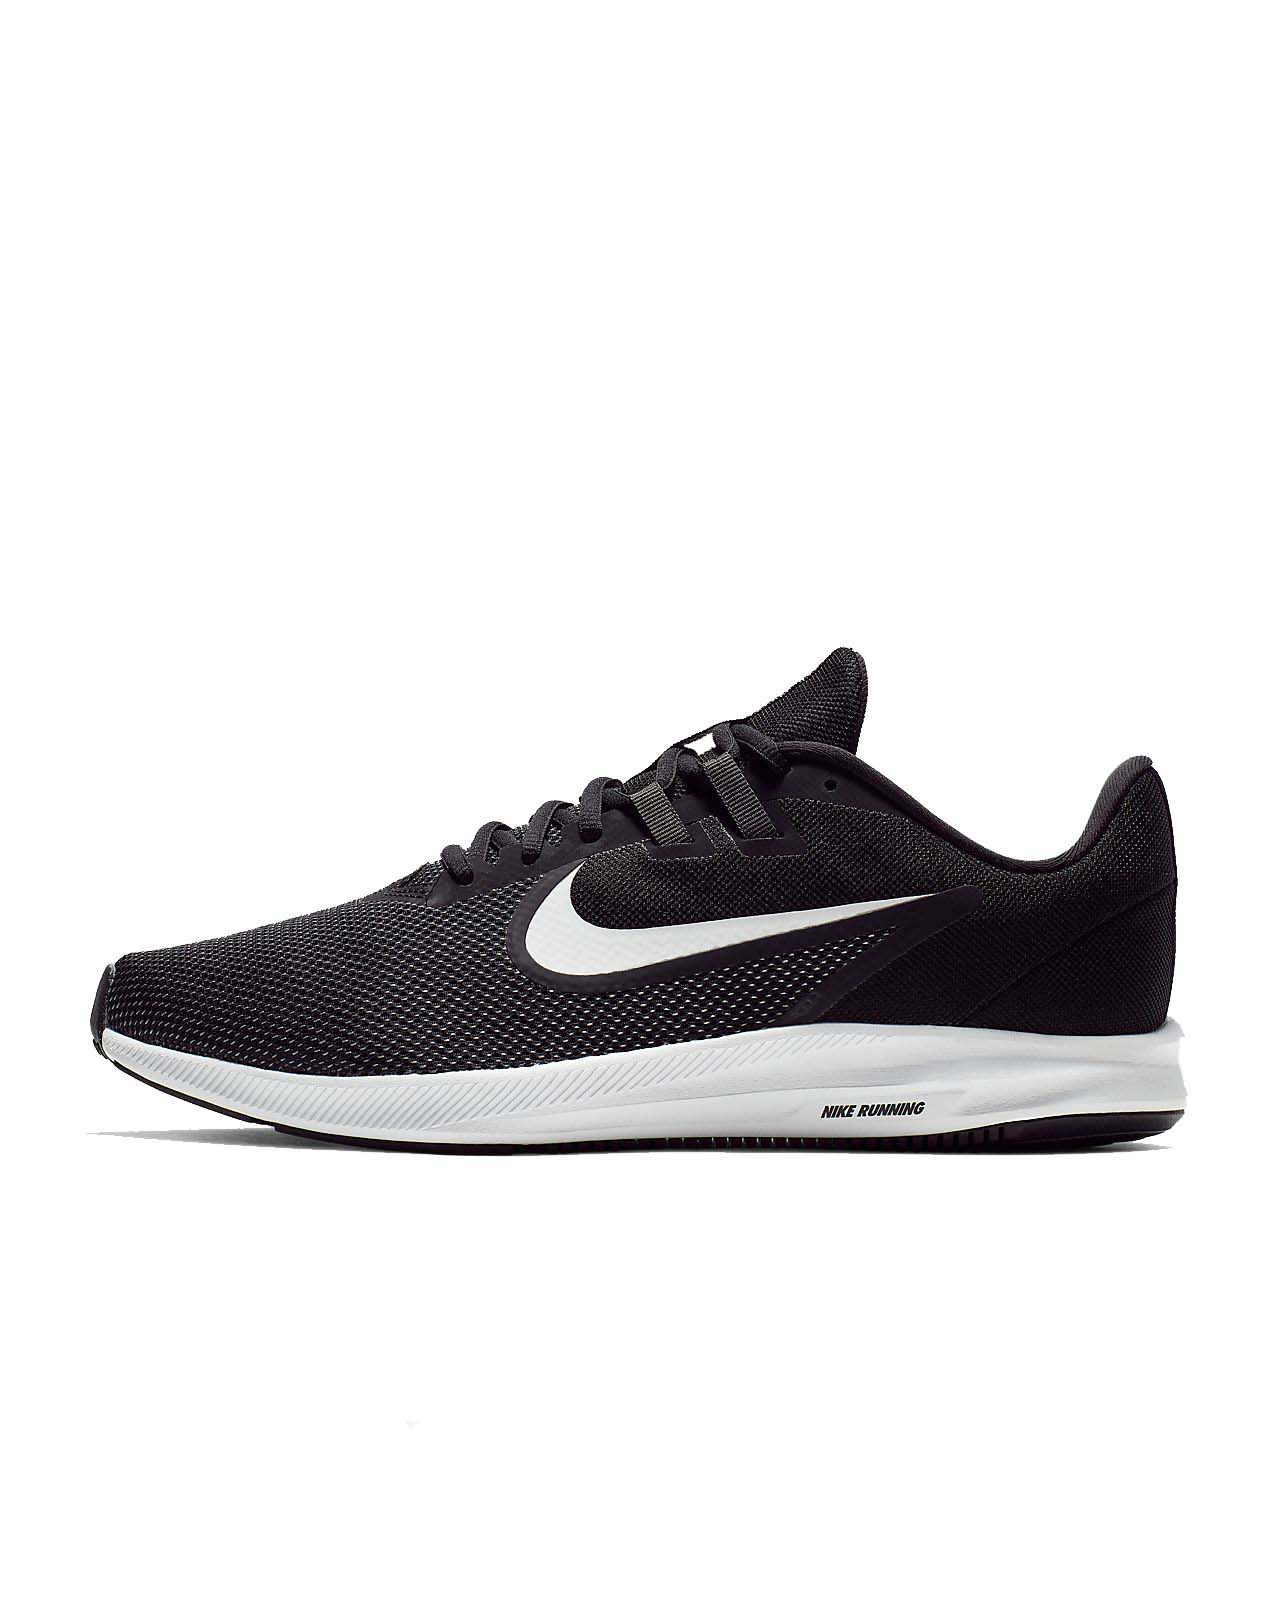 Nike-Men-039-s-Downshifter-9-Wide-Running-Shoes thumbnail 2